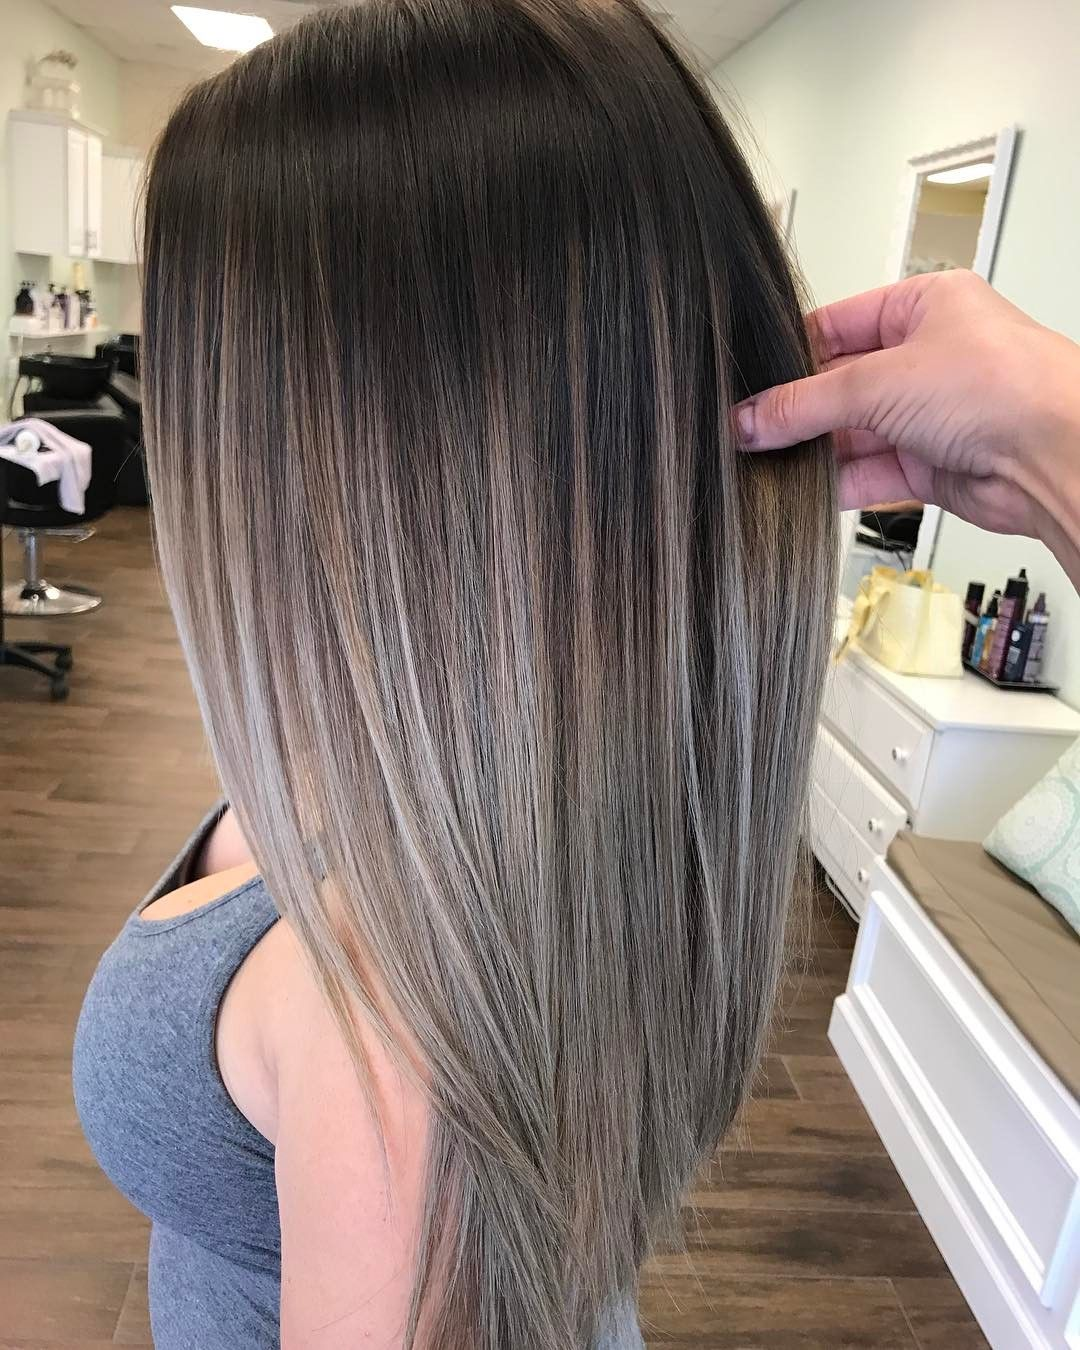 Frisur - Frisuren Stil Haar #hair